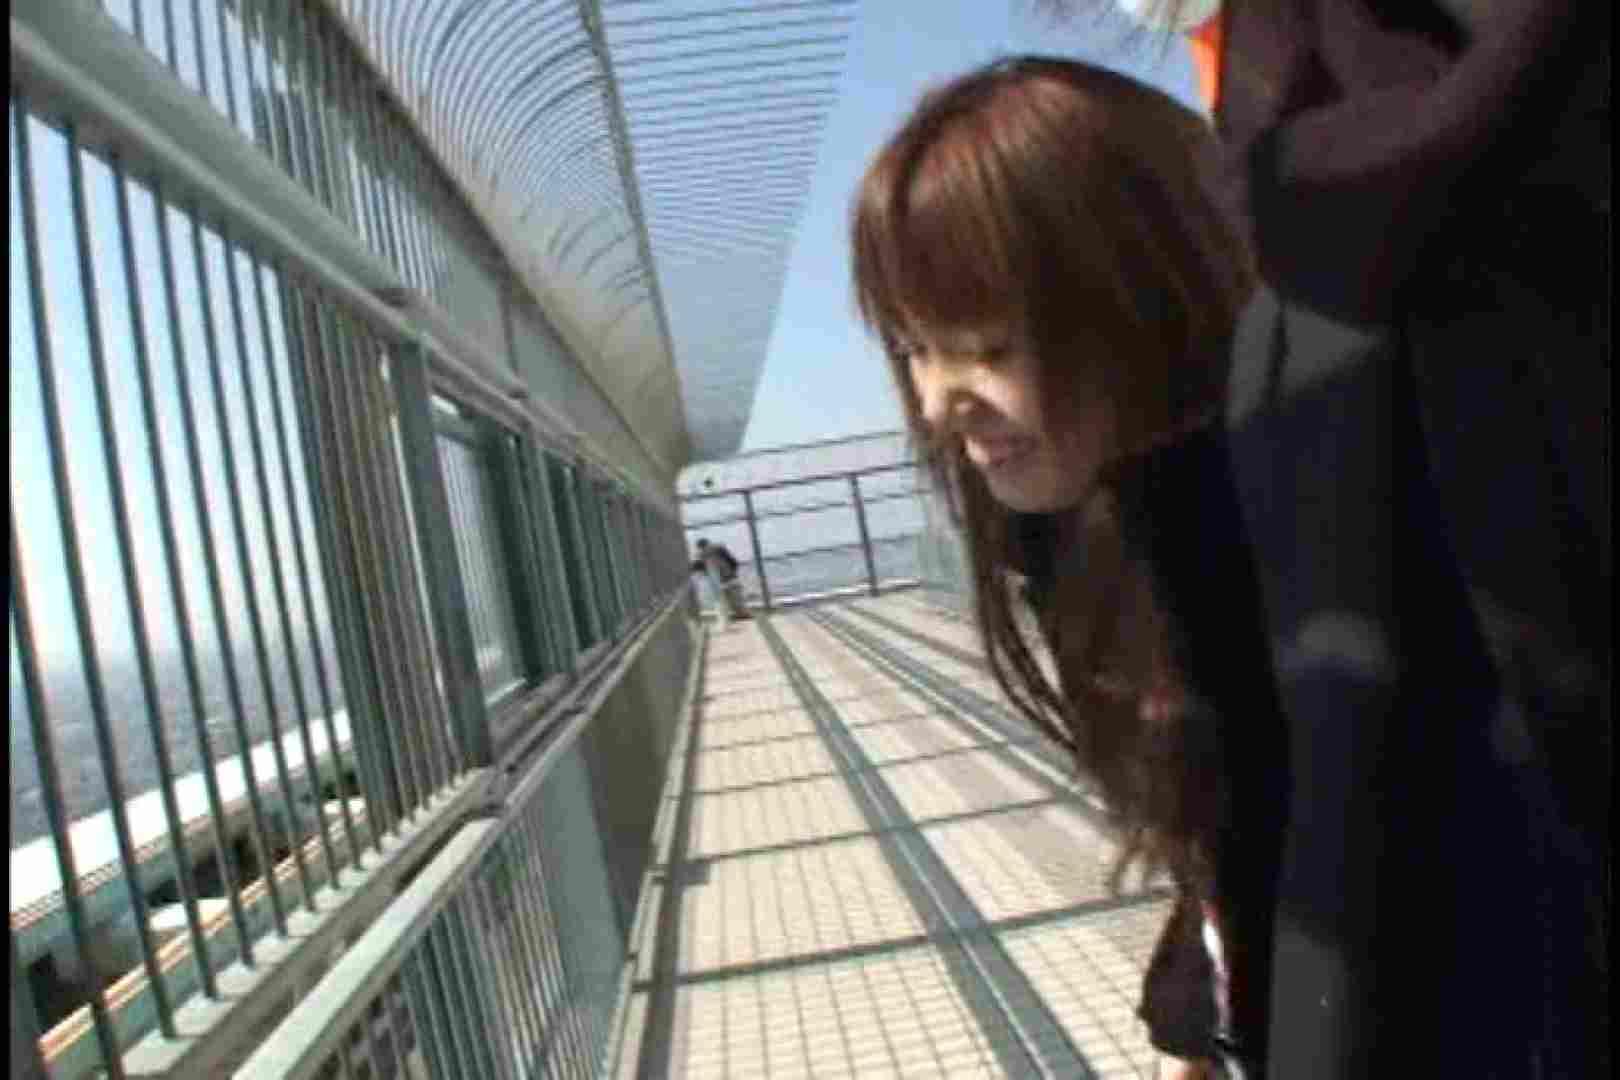 JDハンター全国ツアー vol.017 前編 女子大生のエロ生活  66連発 28